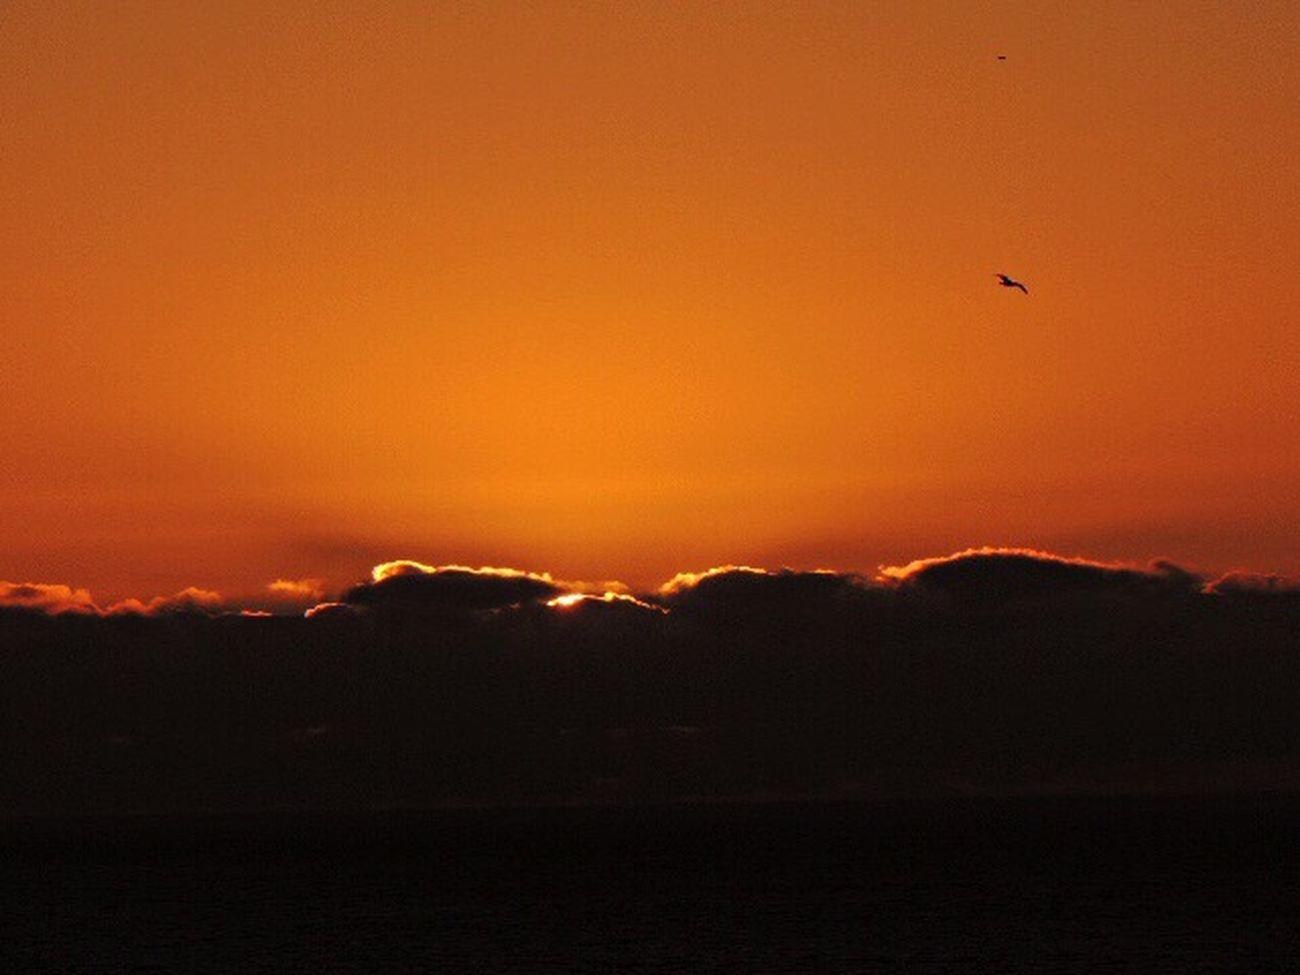 Sunset Today Sunset Sunset Silhouettes Sunset Fire  Sun Through The Clouds Sea And Sunset Orange Sky Dark Clouds Darkness And Light Bird In Flight Eye Em Nature Lover Sunset_captures Reñaca Beach , Chile